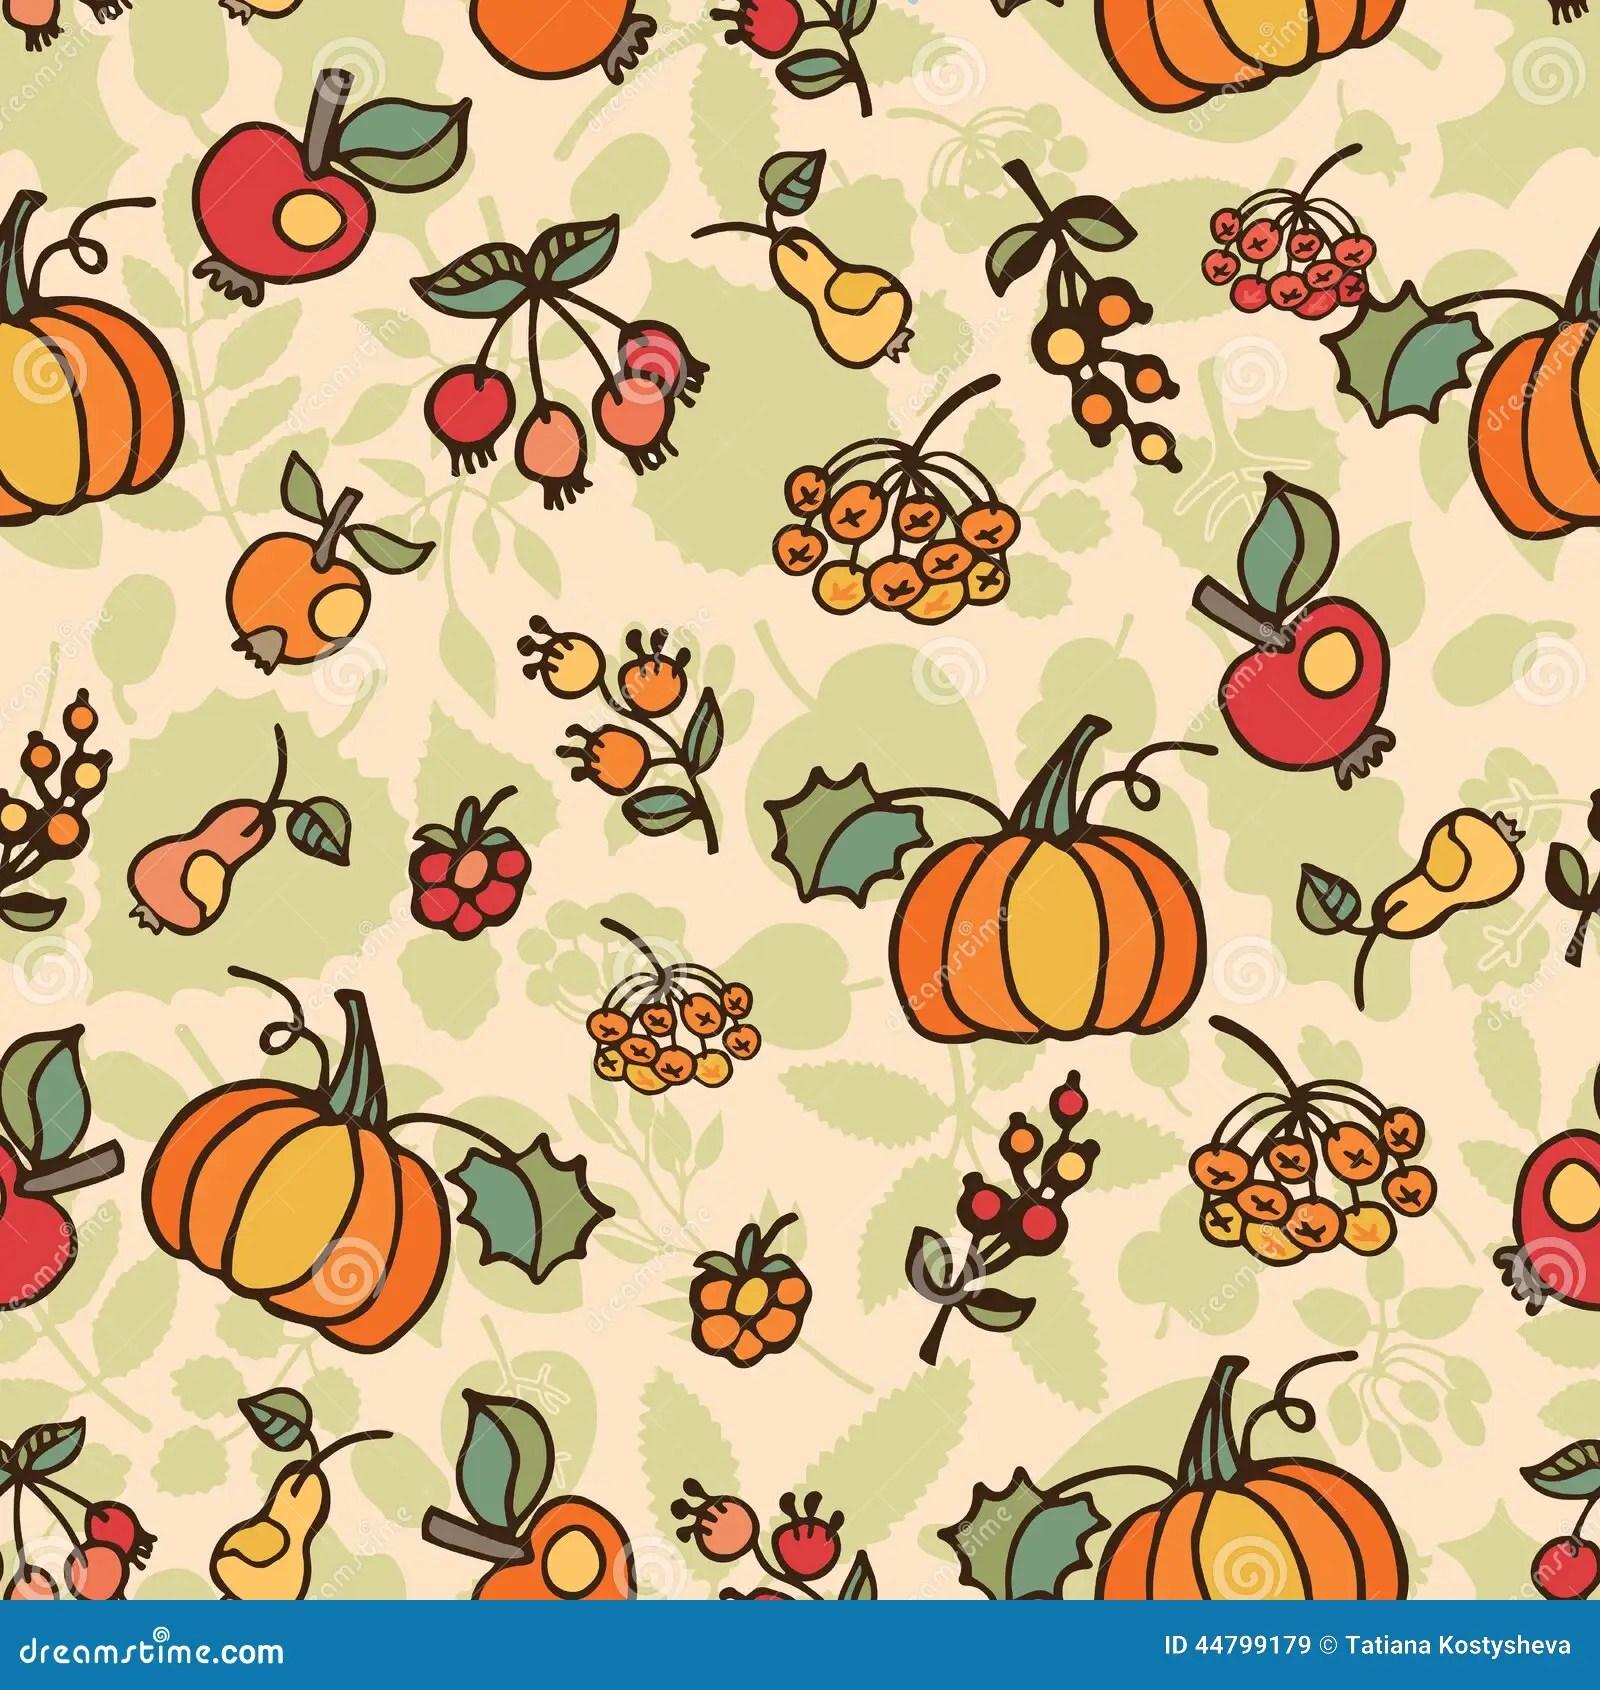 Fall Wallpaper With Pumpkins Doodle Seamless Pattern Autumn Harvest Fruit Stock